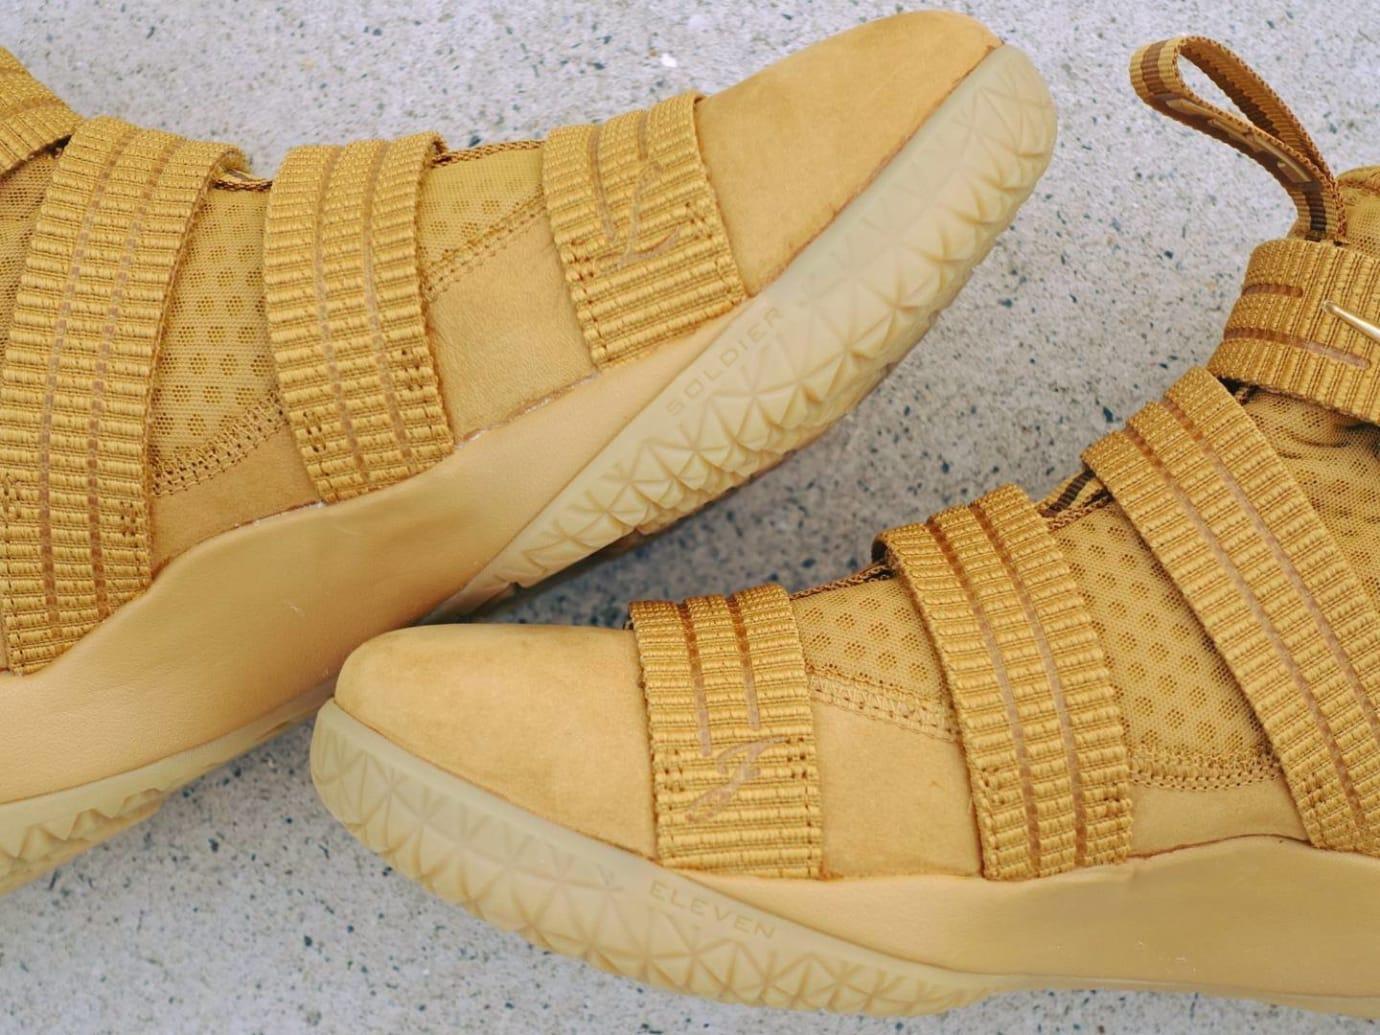 66b500827b9 Nike LeBron Soldier 11 SFG Wheat Release Date 897647-700 (3)